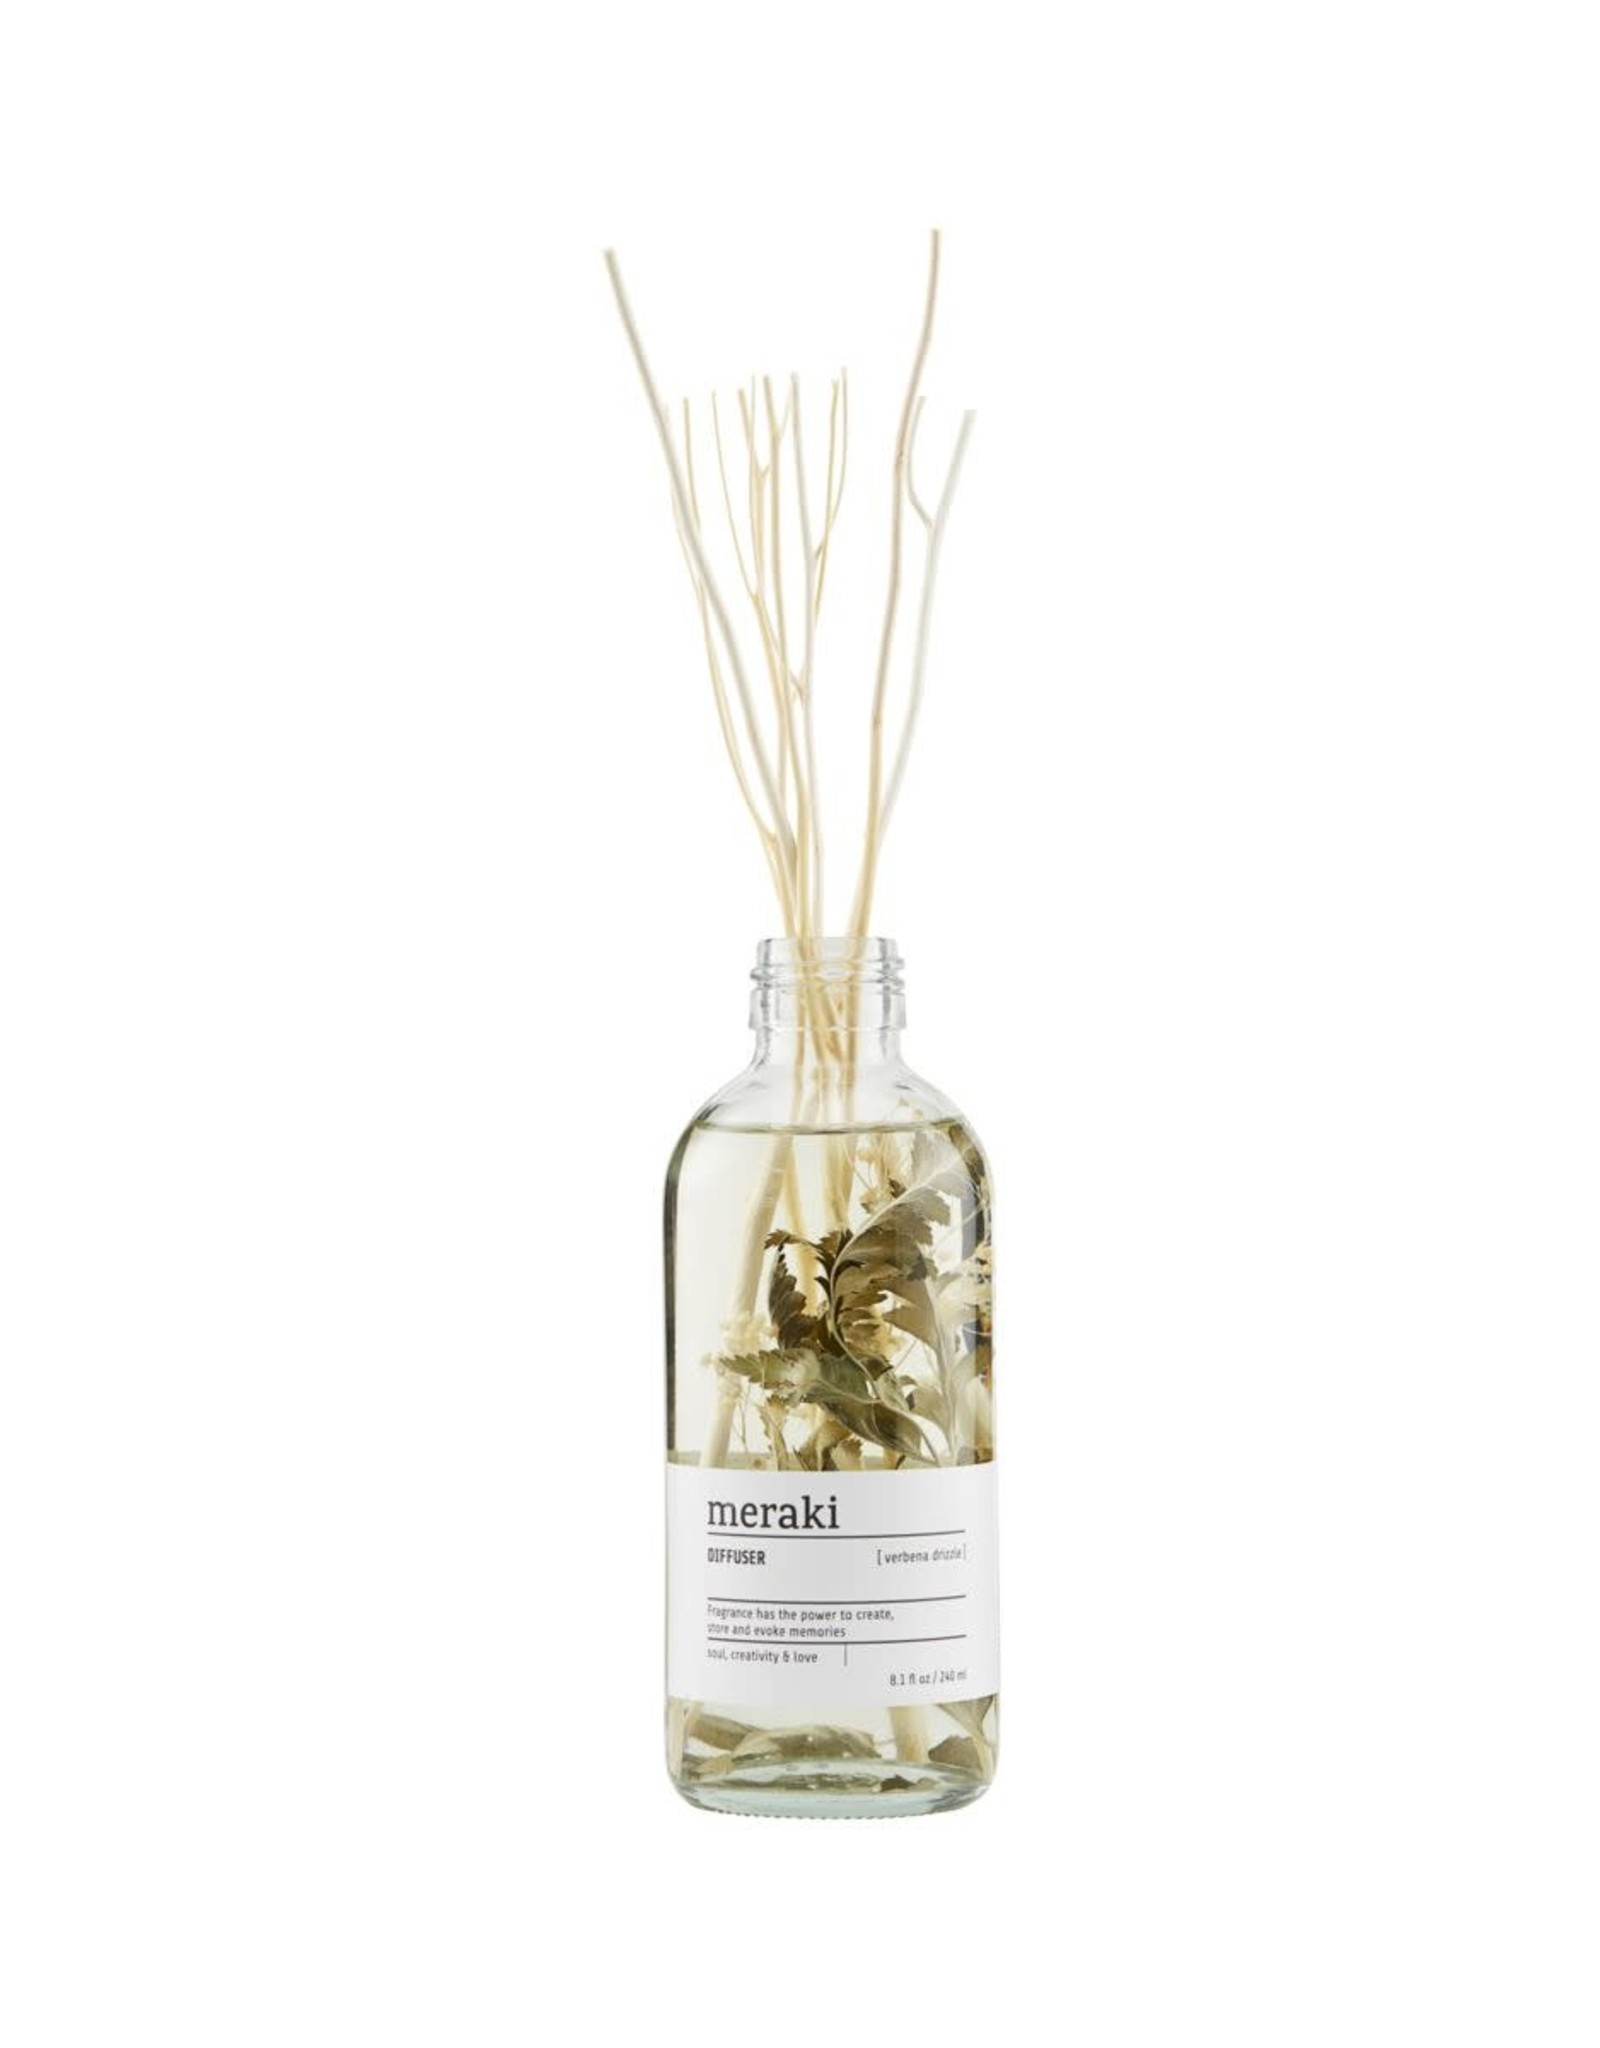 Meraki Diffuser Glass Flowers-verbena drizzle